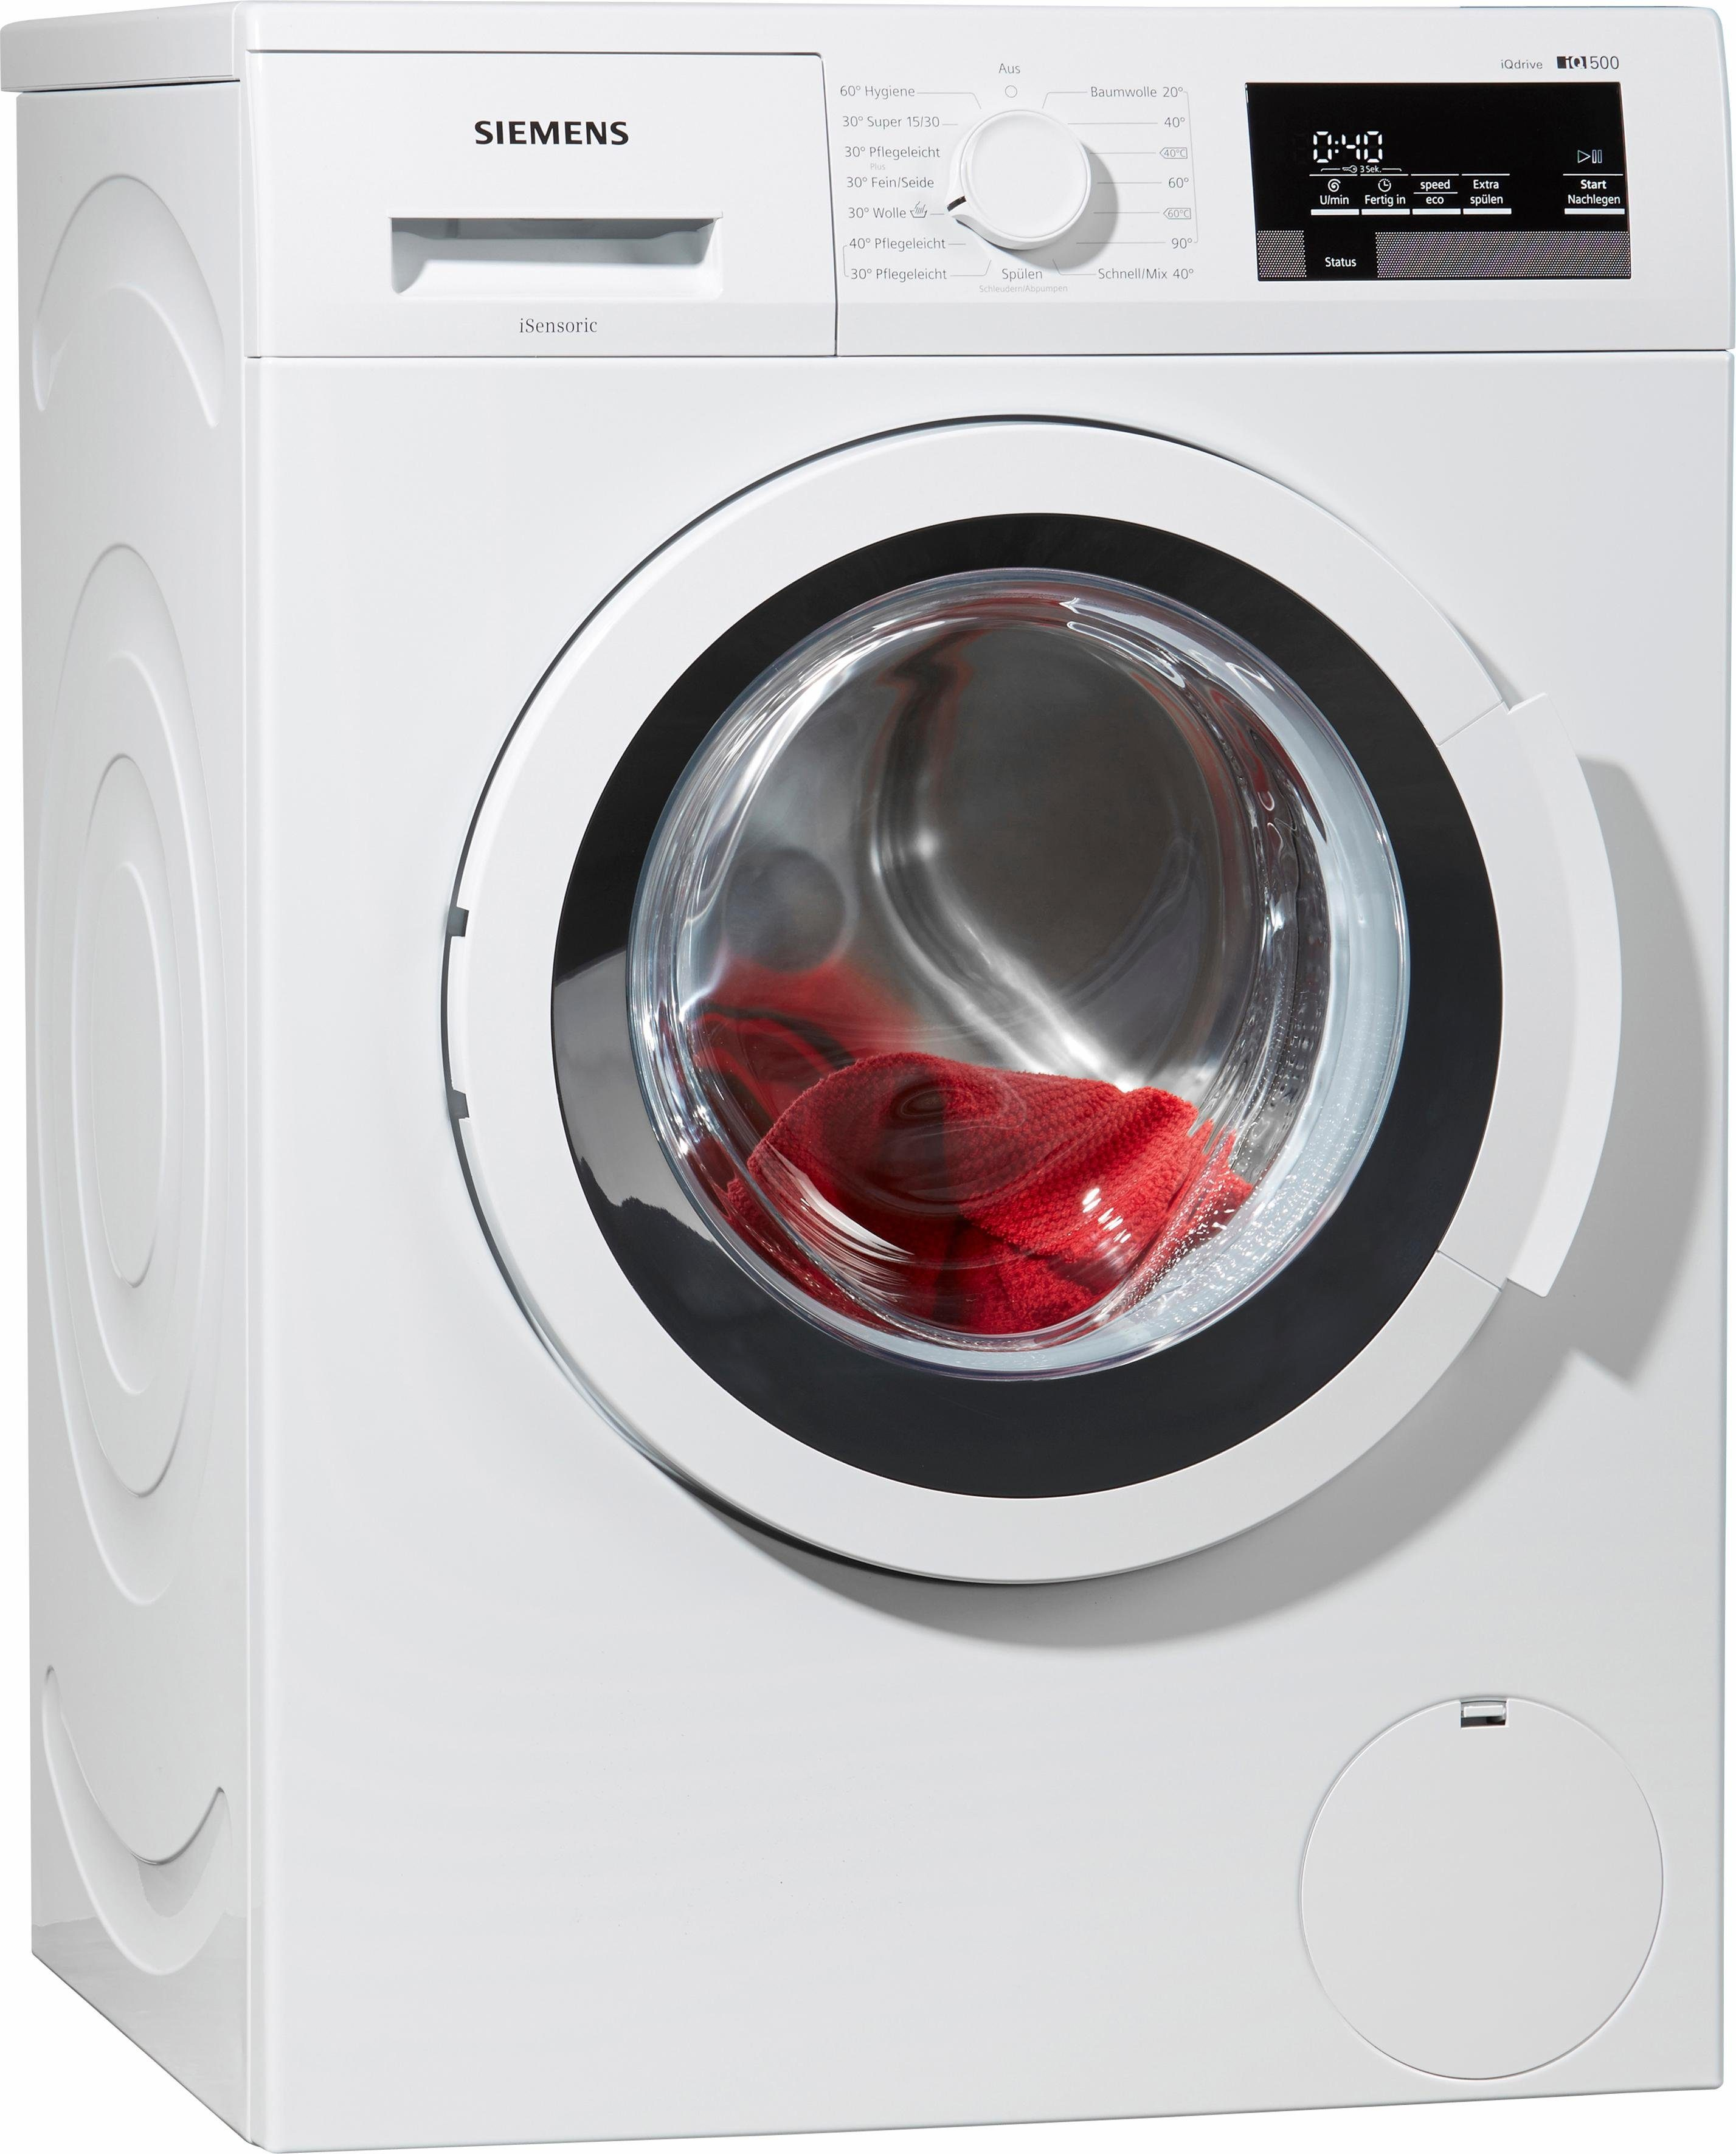 SIEMENS Waschmaschine iQ500 WM14T3S30, A+++, 8 kg, 1400 U/Min